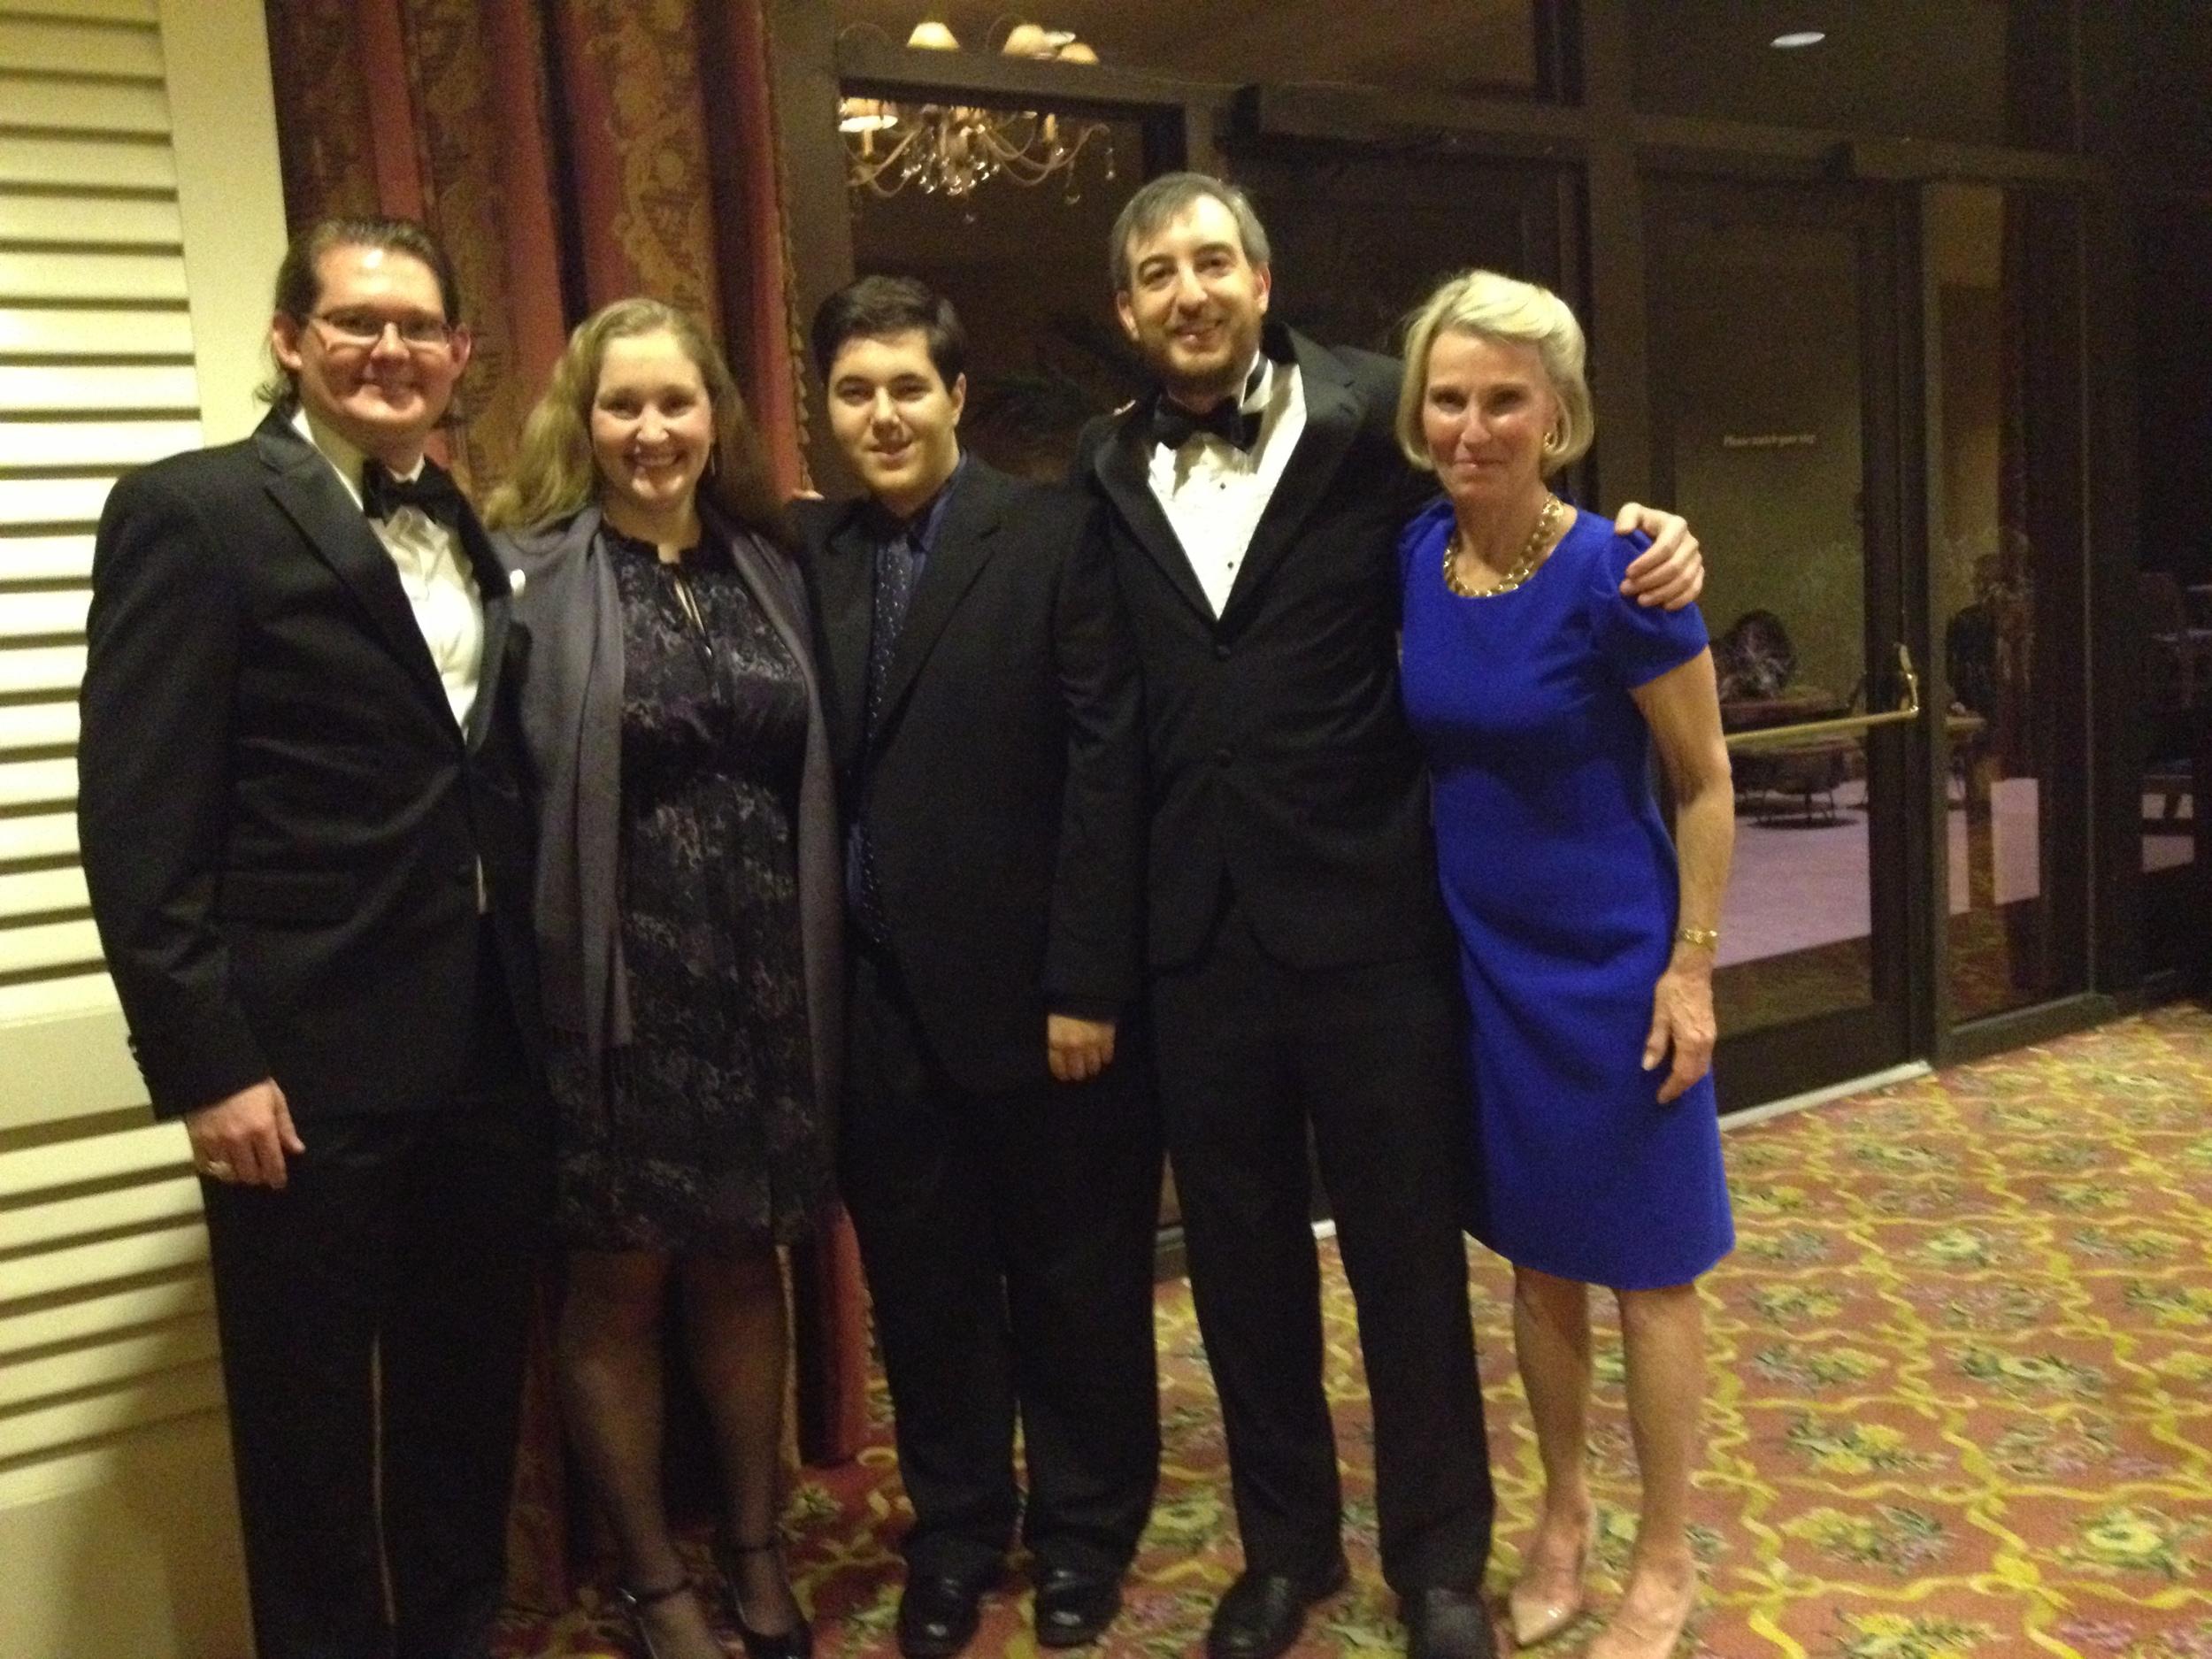 Robert, Theri, Adam K, Adam P, Patty - Bermuda 2013